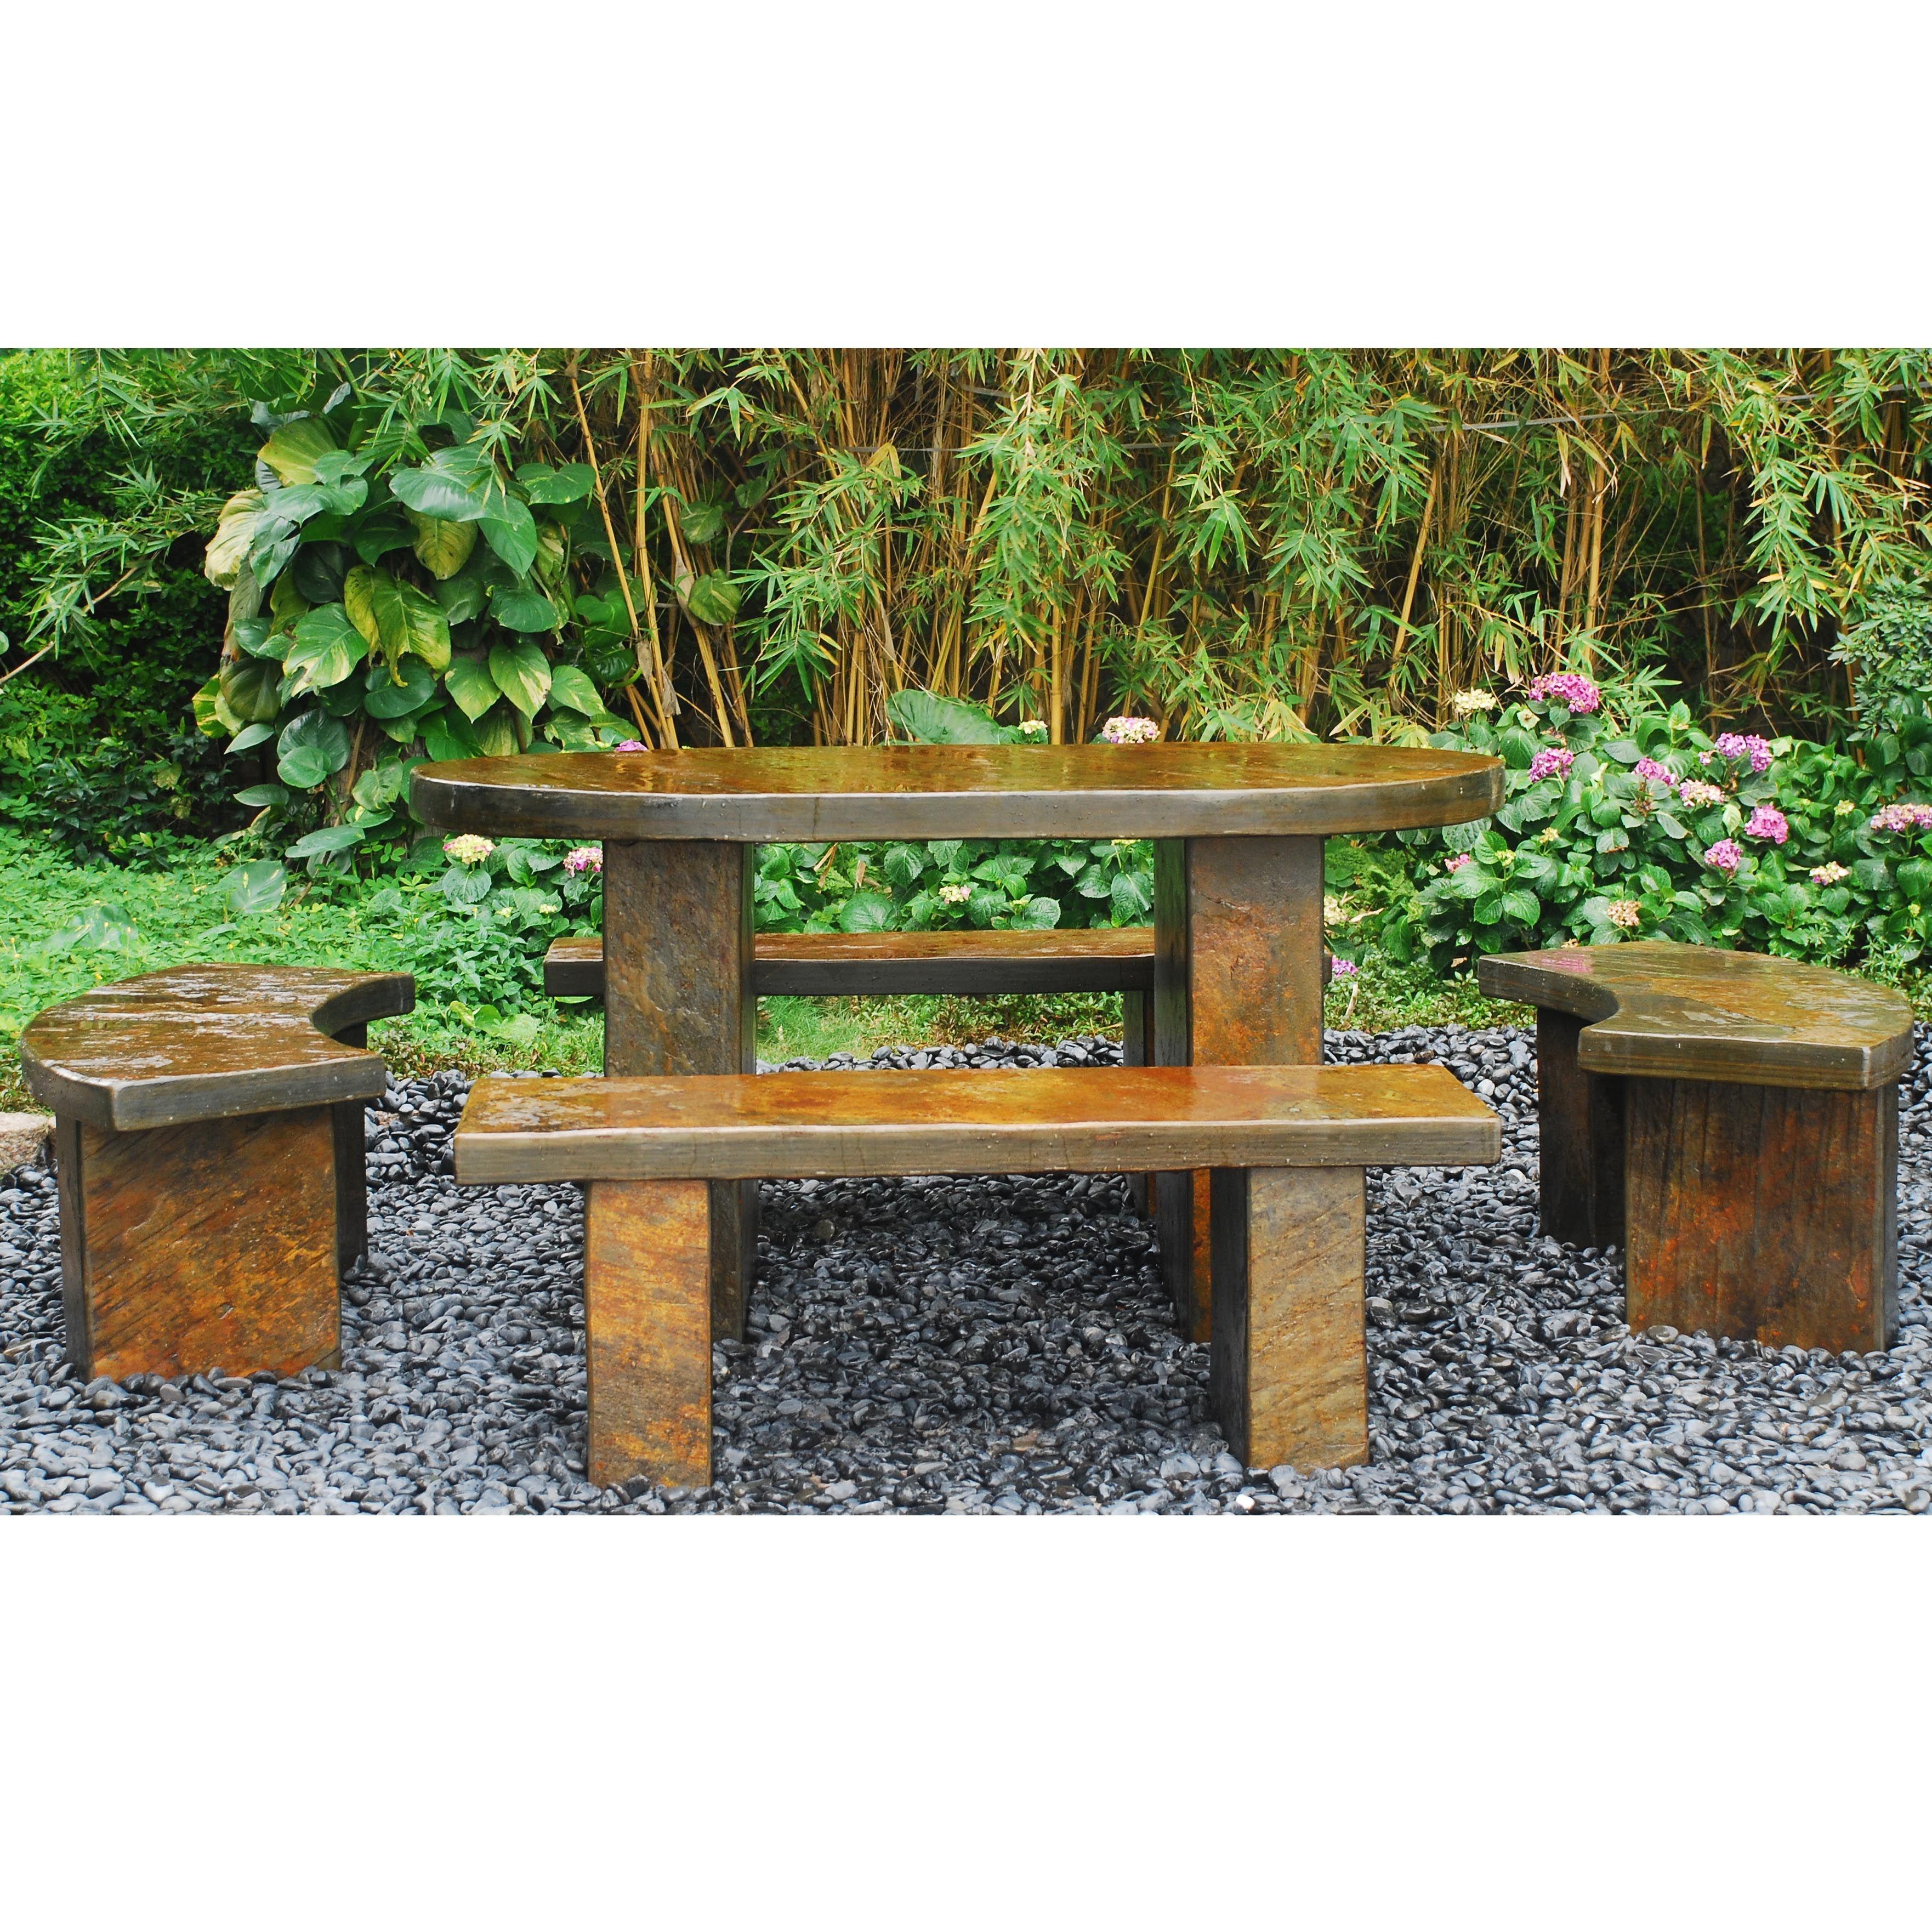 Japanese Garden Furniture. Aqaril Slate Table Set Japanese Garden Furniture  B